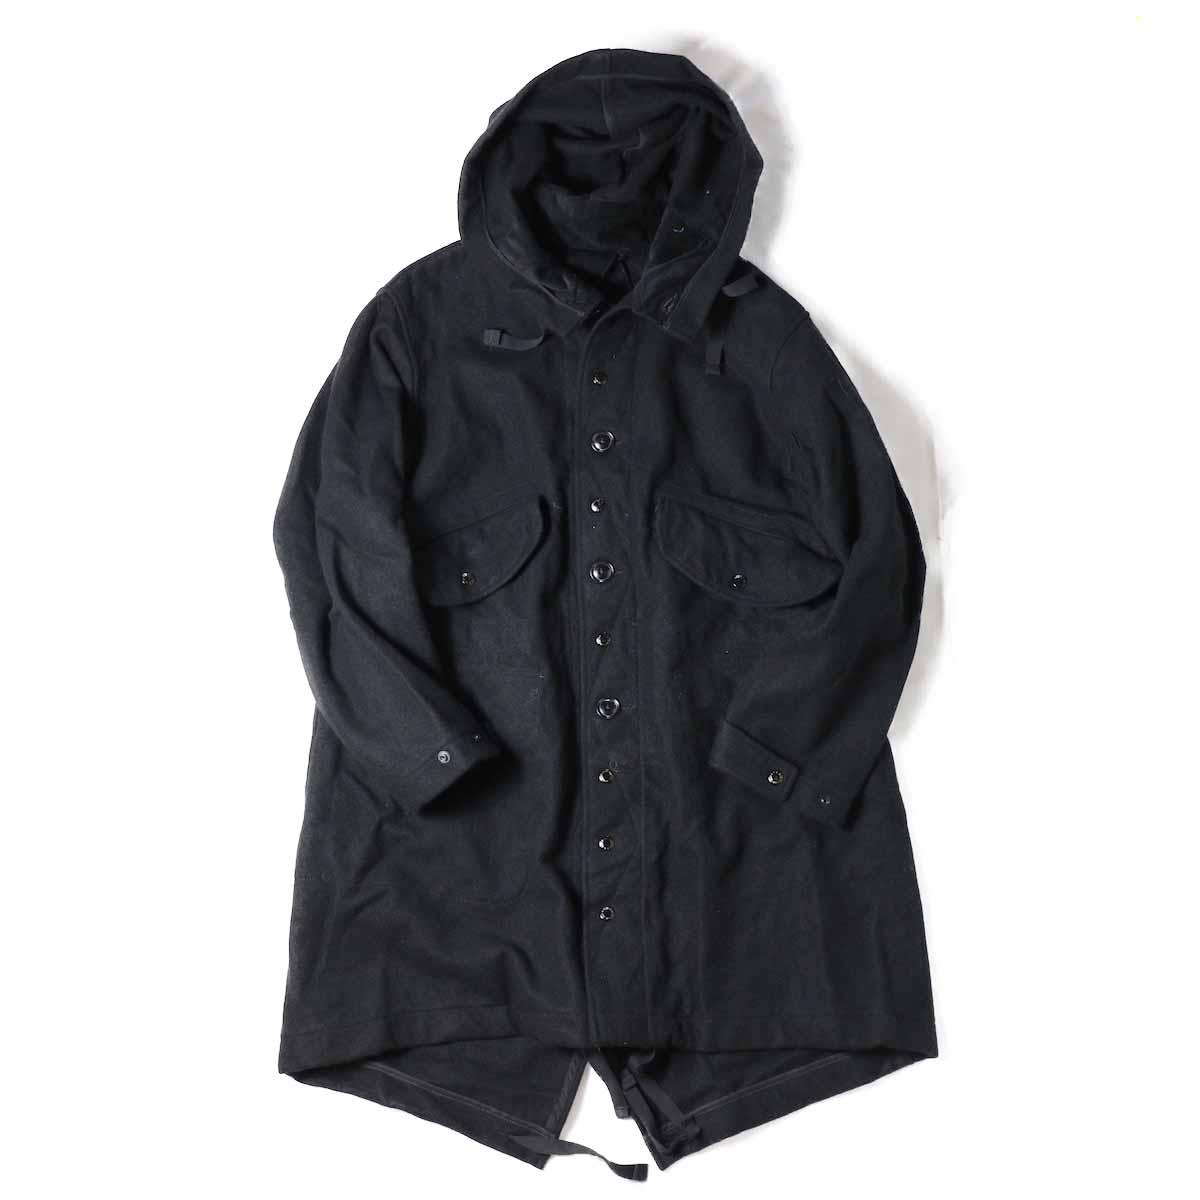 Engineered Garments / Highland Parka - Wool Melton